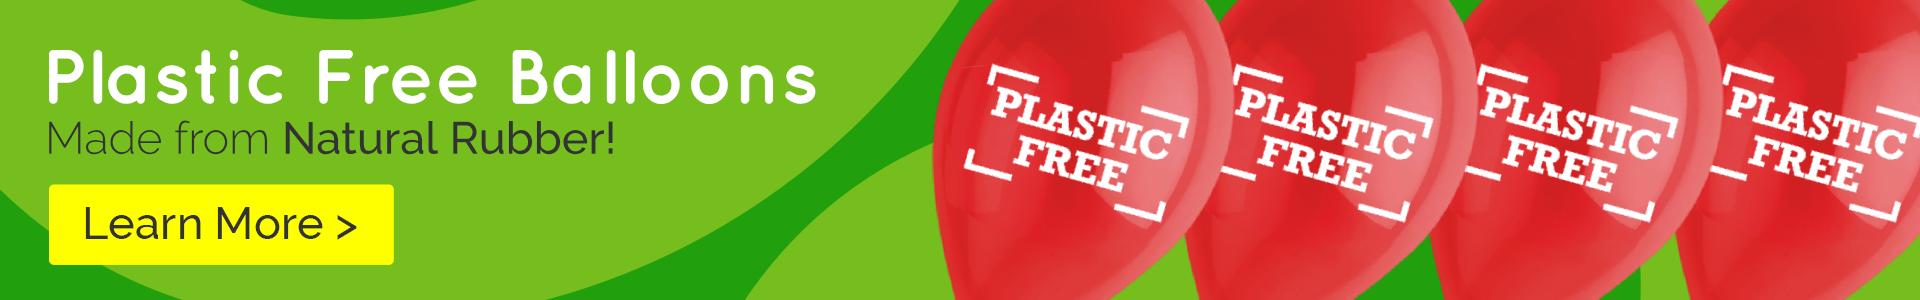 Plastic Free Balloons